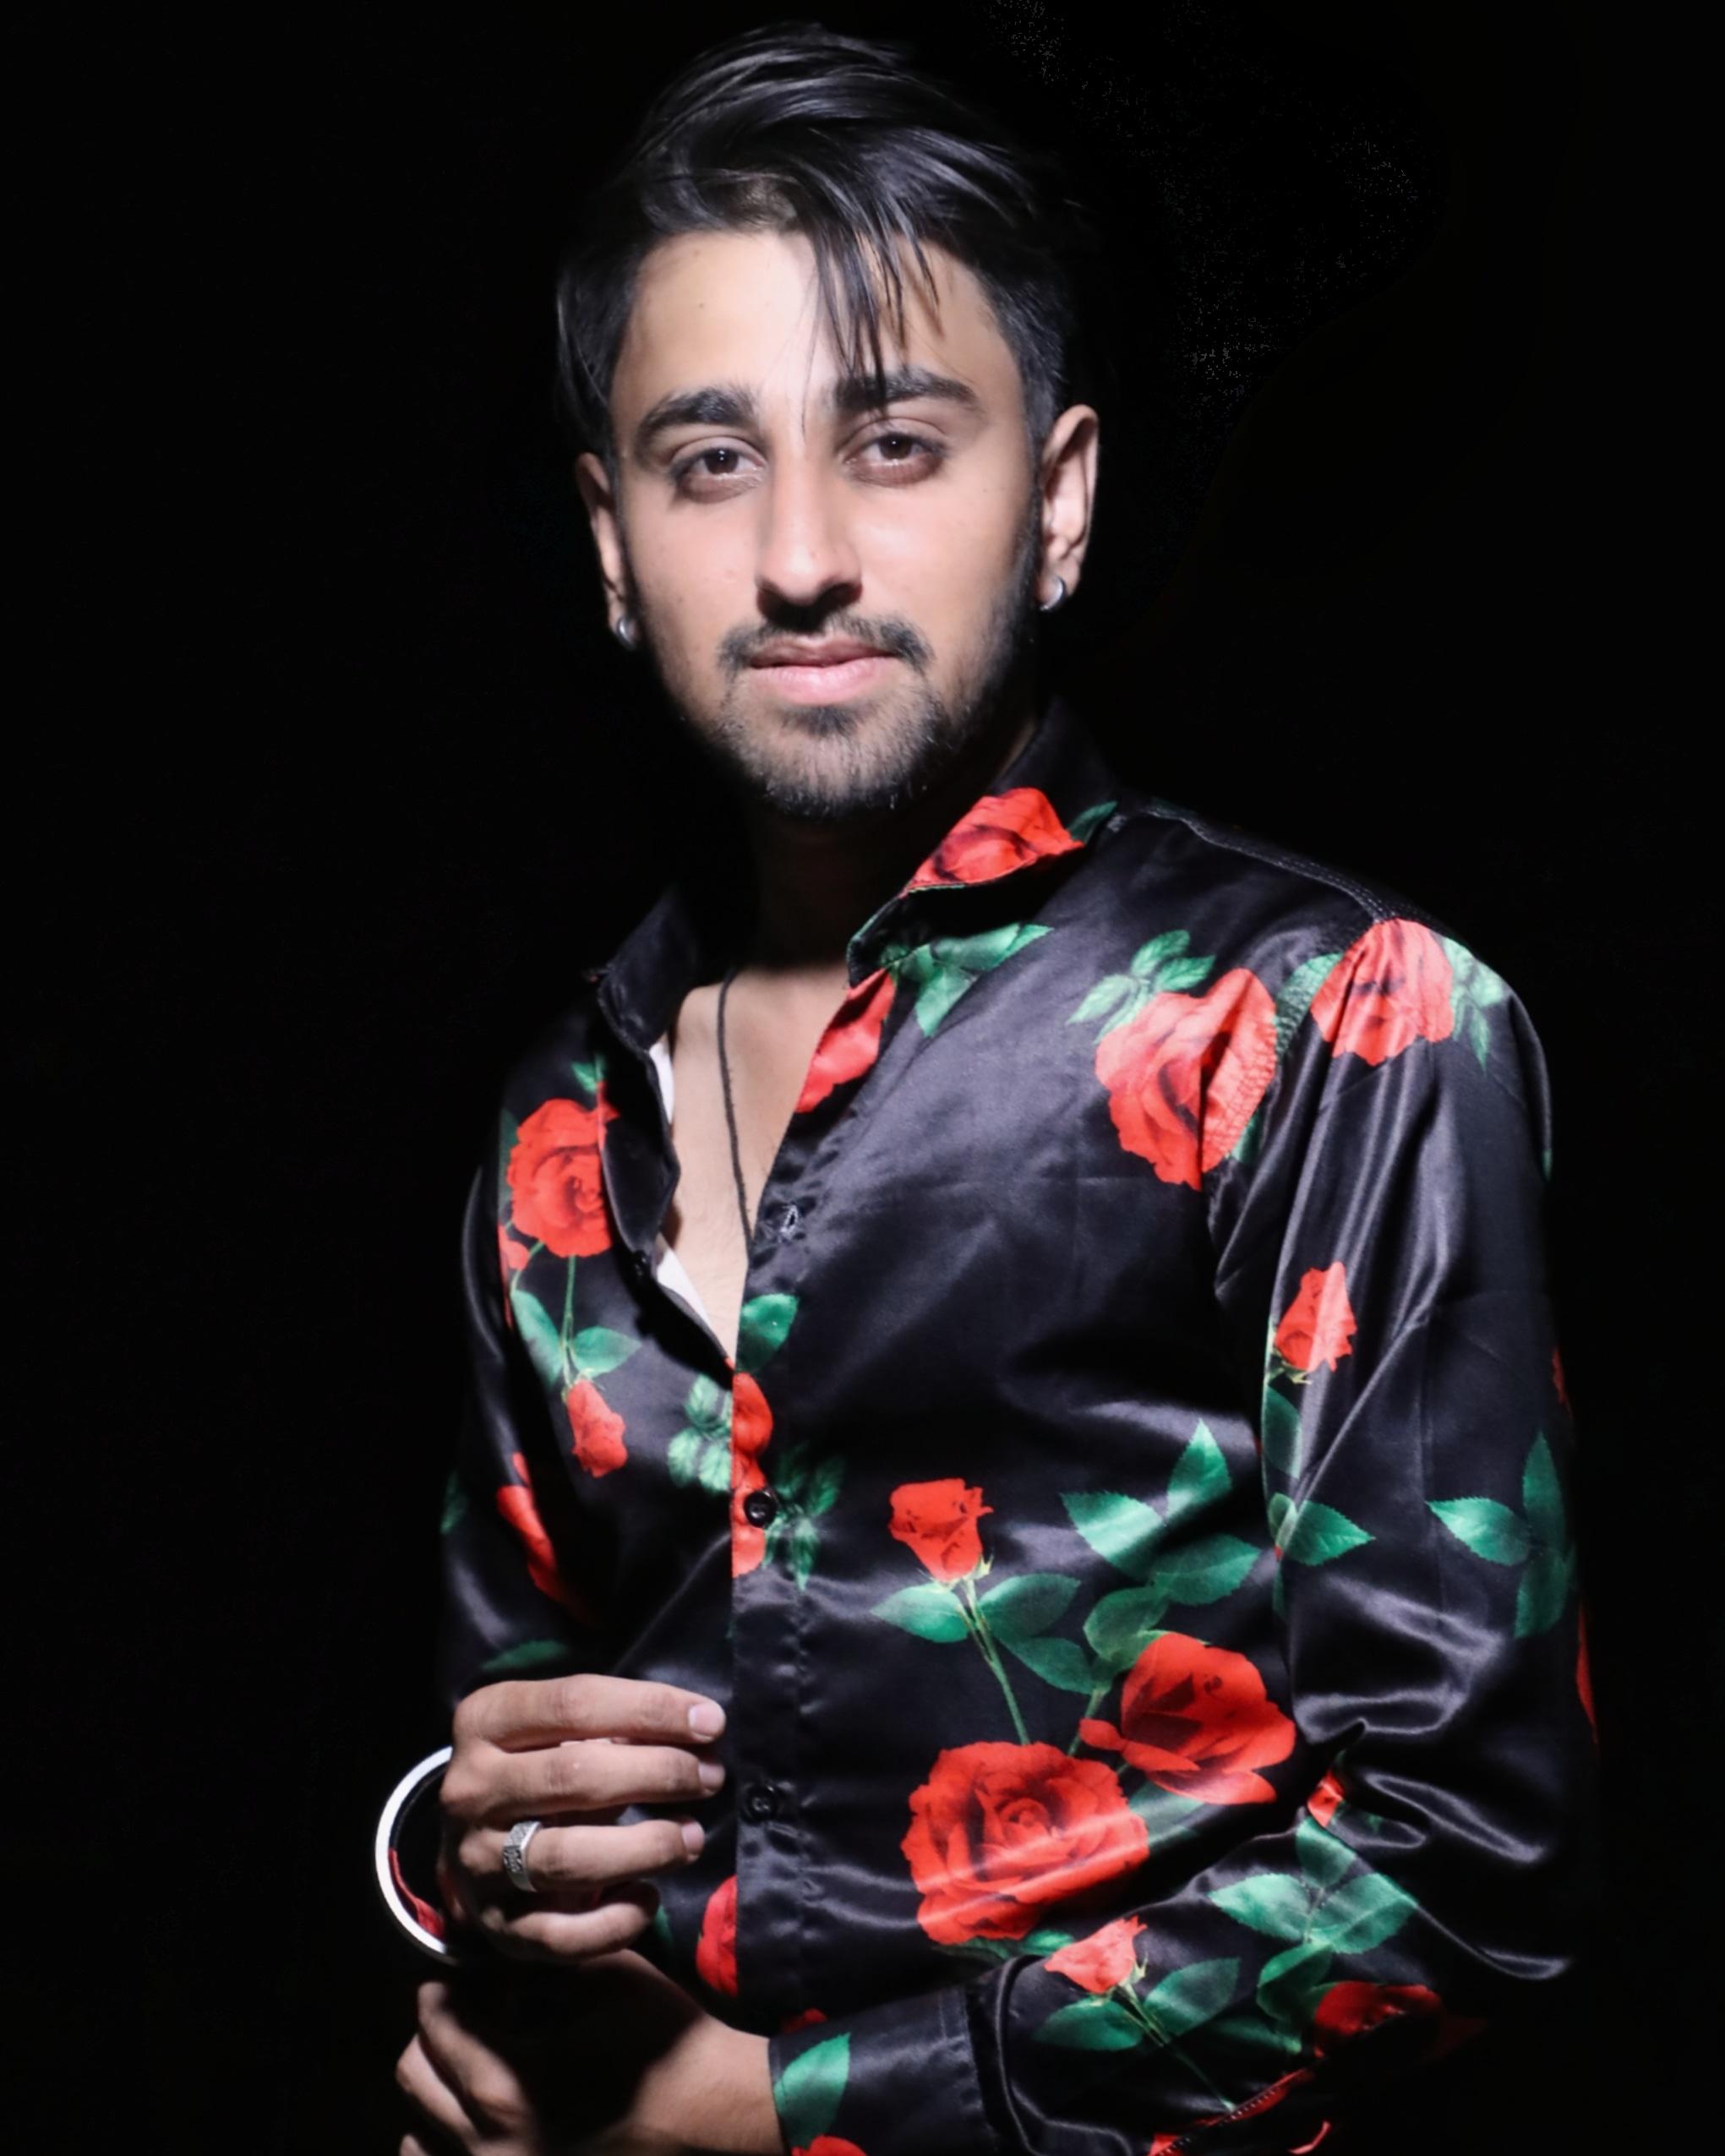 Vijay Singh Sewad is singlehandedly building India's modelling industry: